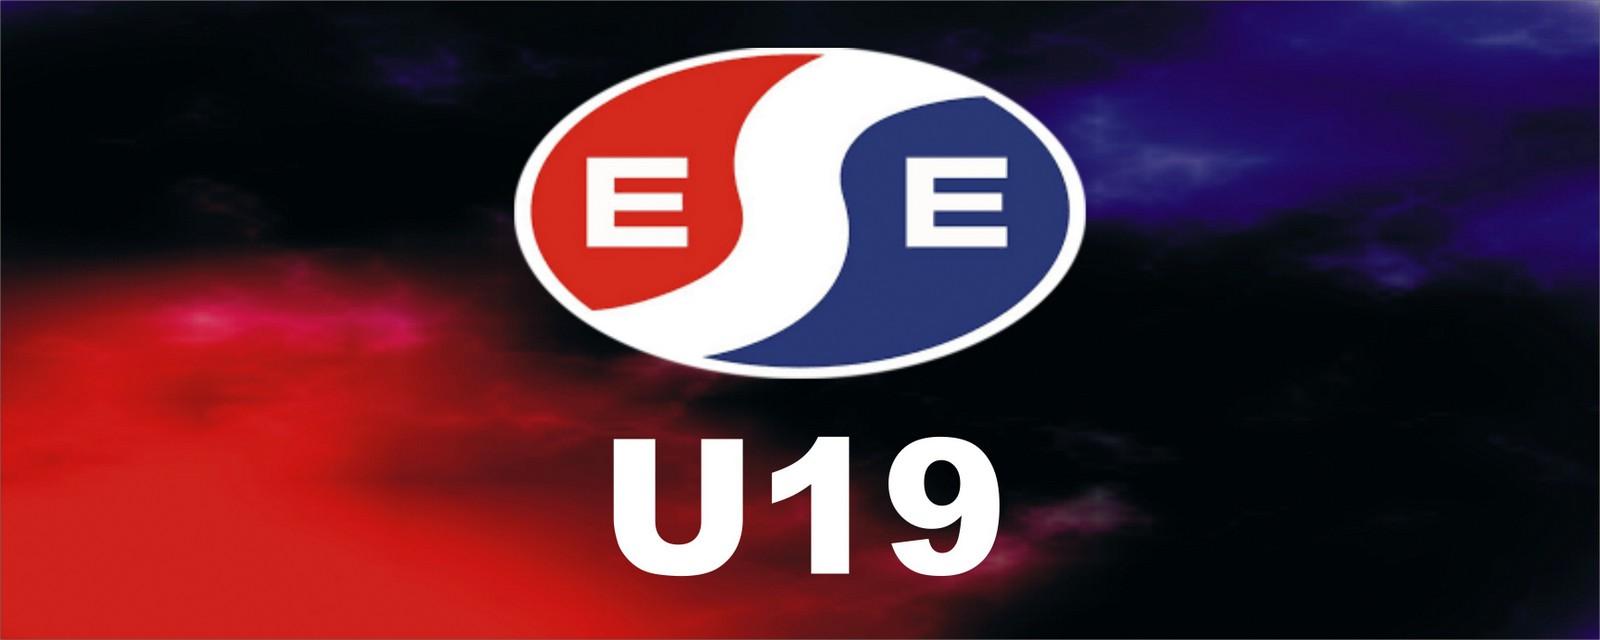 U19 – SBTC – Eger SE 6-0 (4-0)